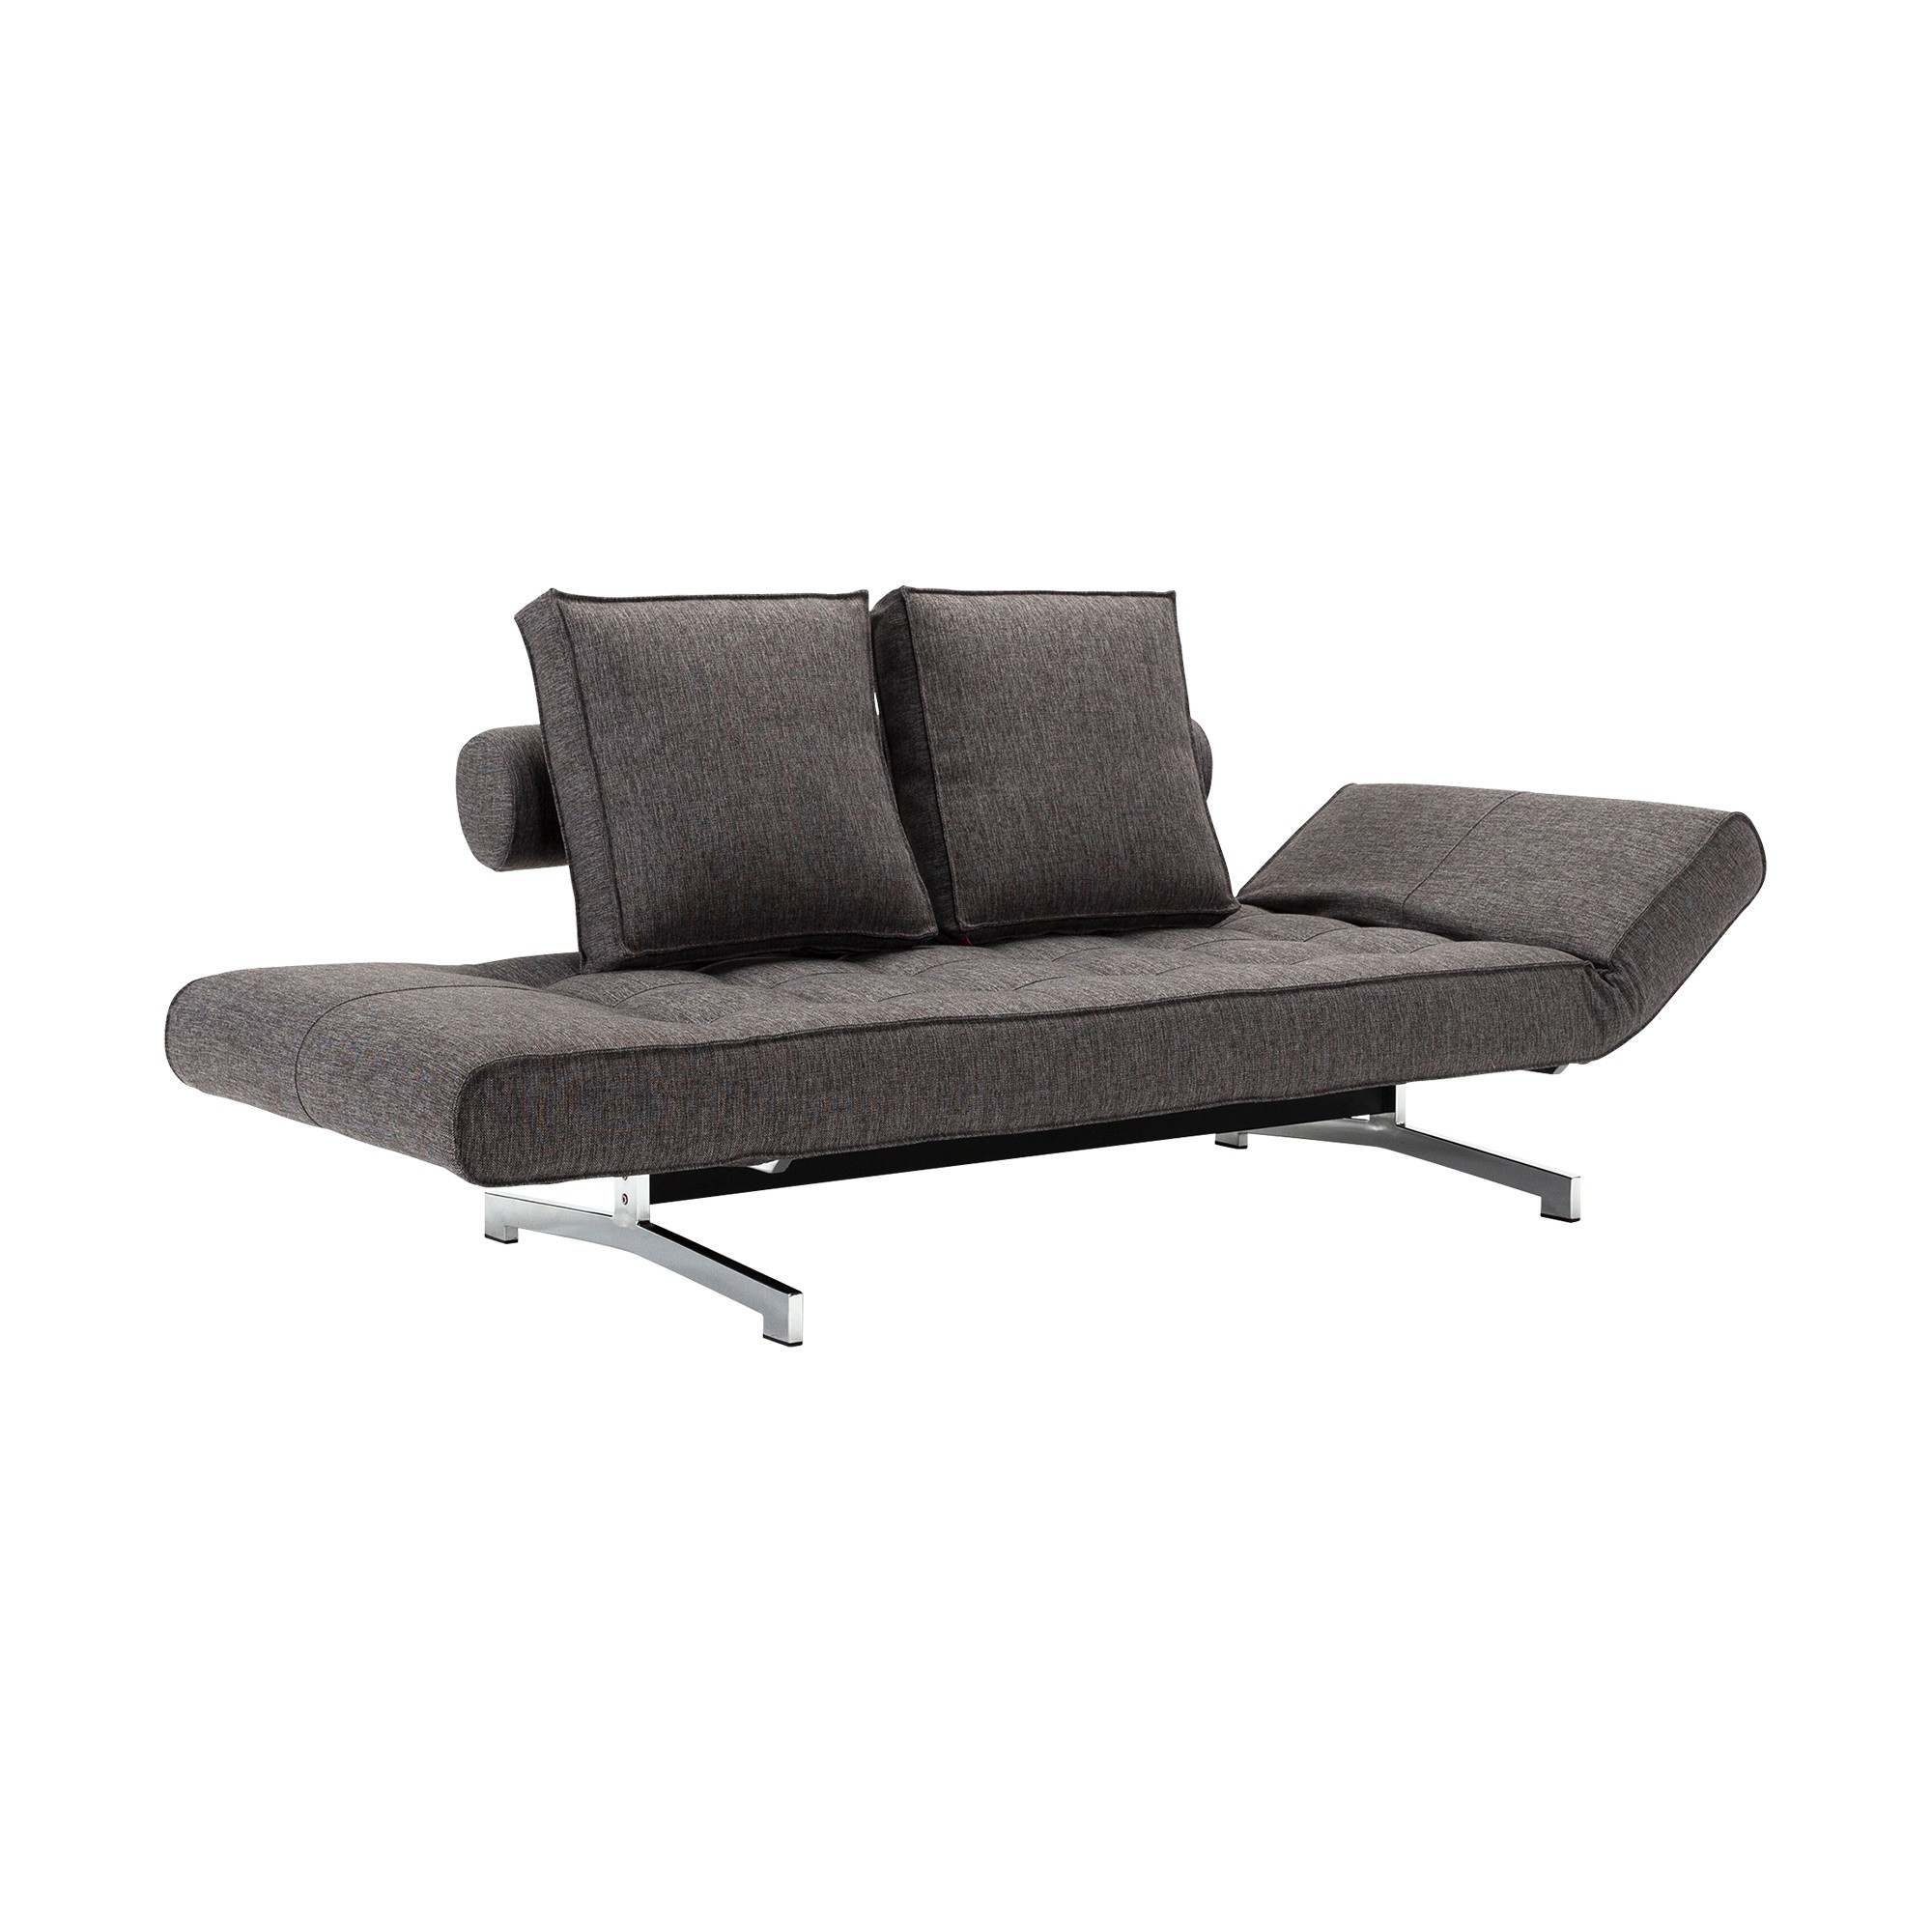 Excellent Ghia Sofa Bed Fabric Legs Chromed Steel 180X90Cm Bralicious Painted Fabric Chair Ideas Braliciousco